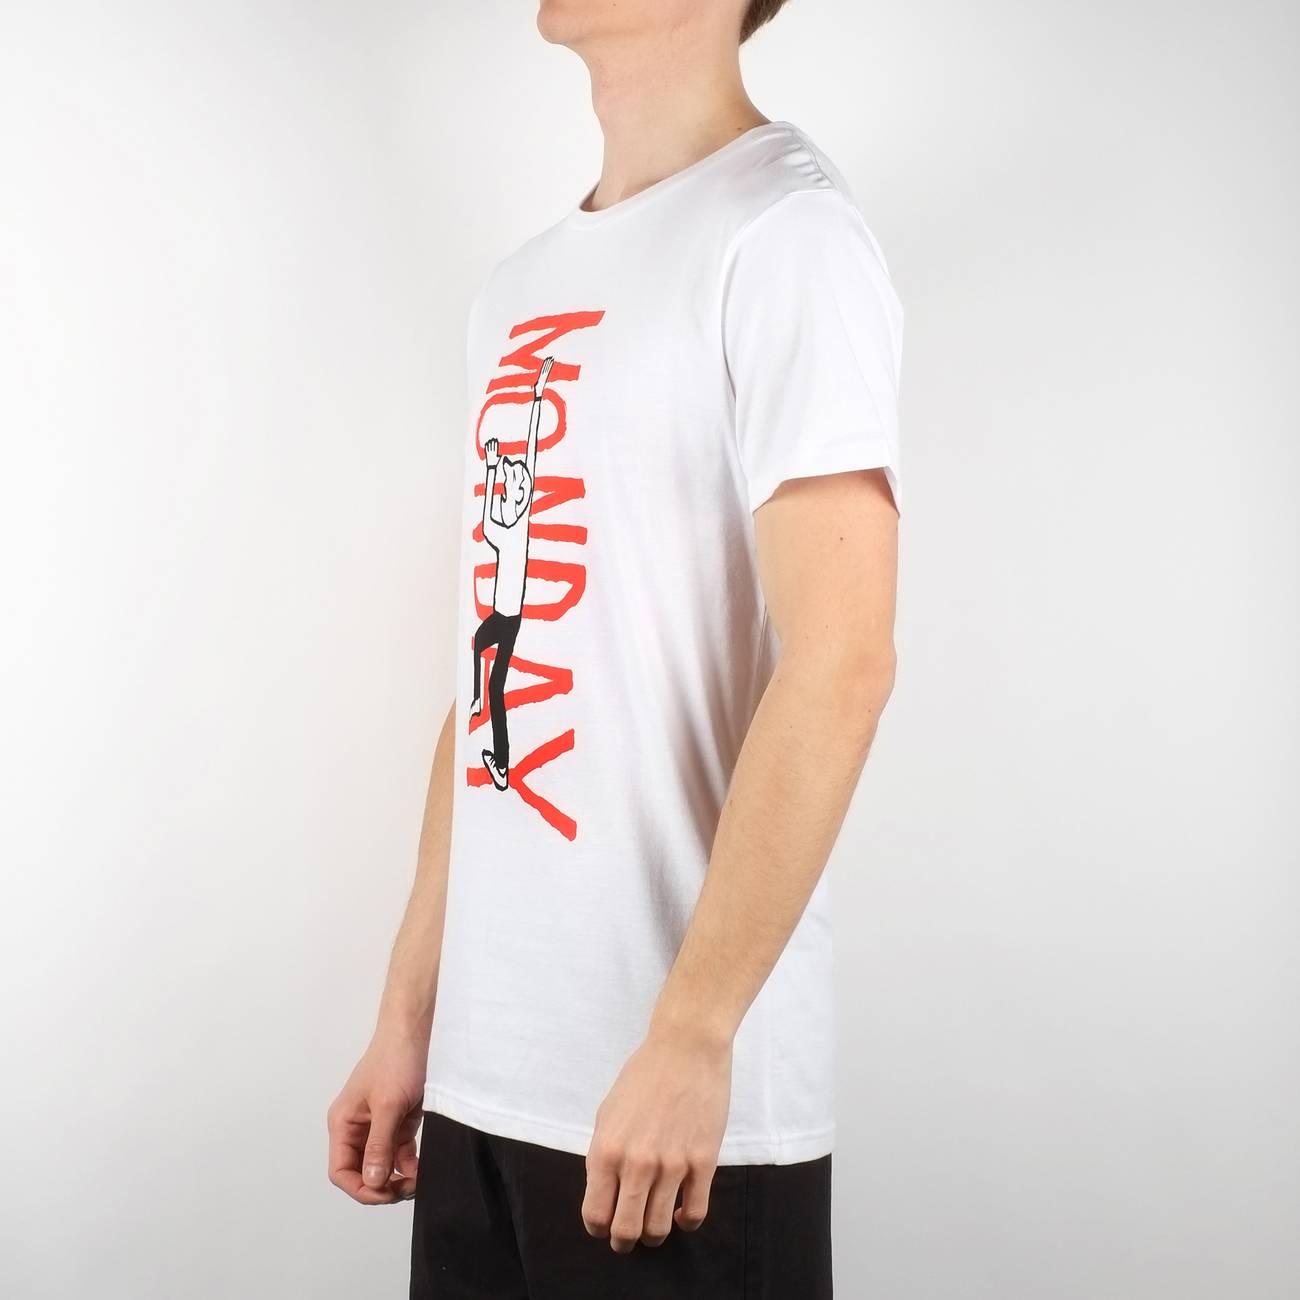 Stockholm T-shirt Monday